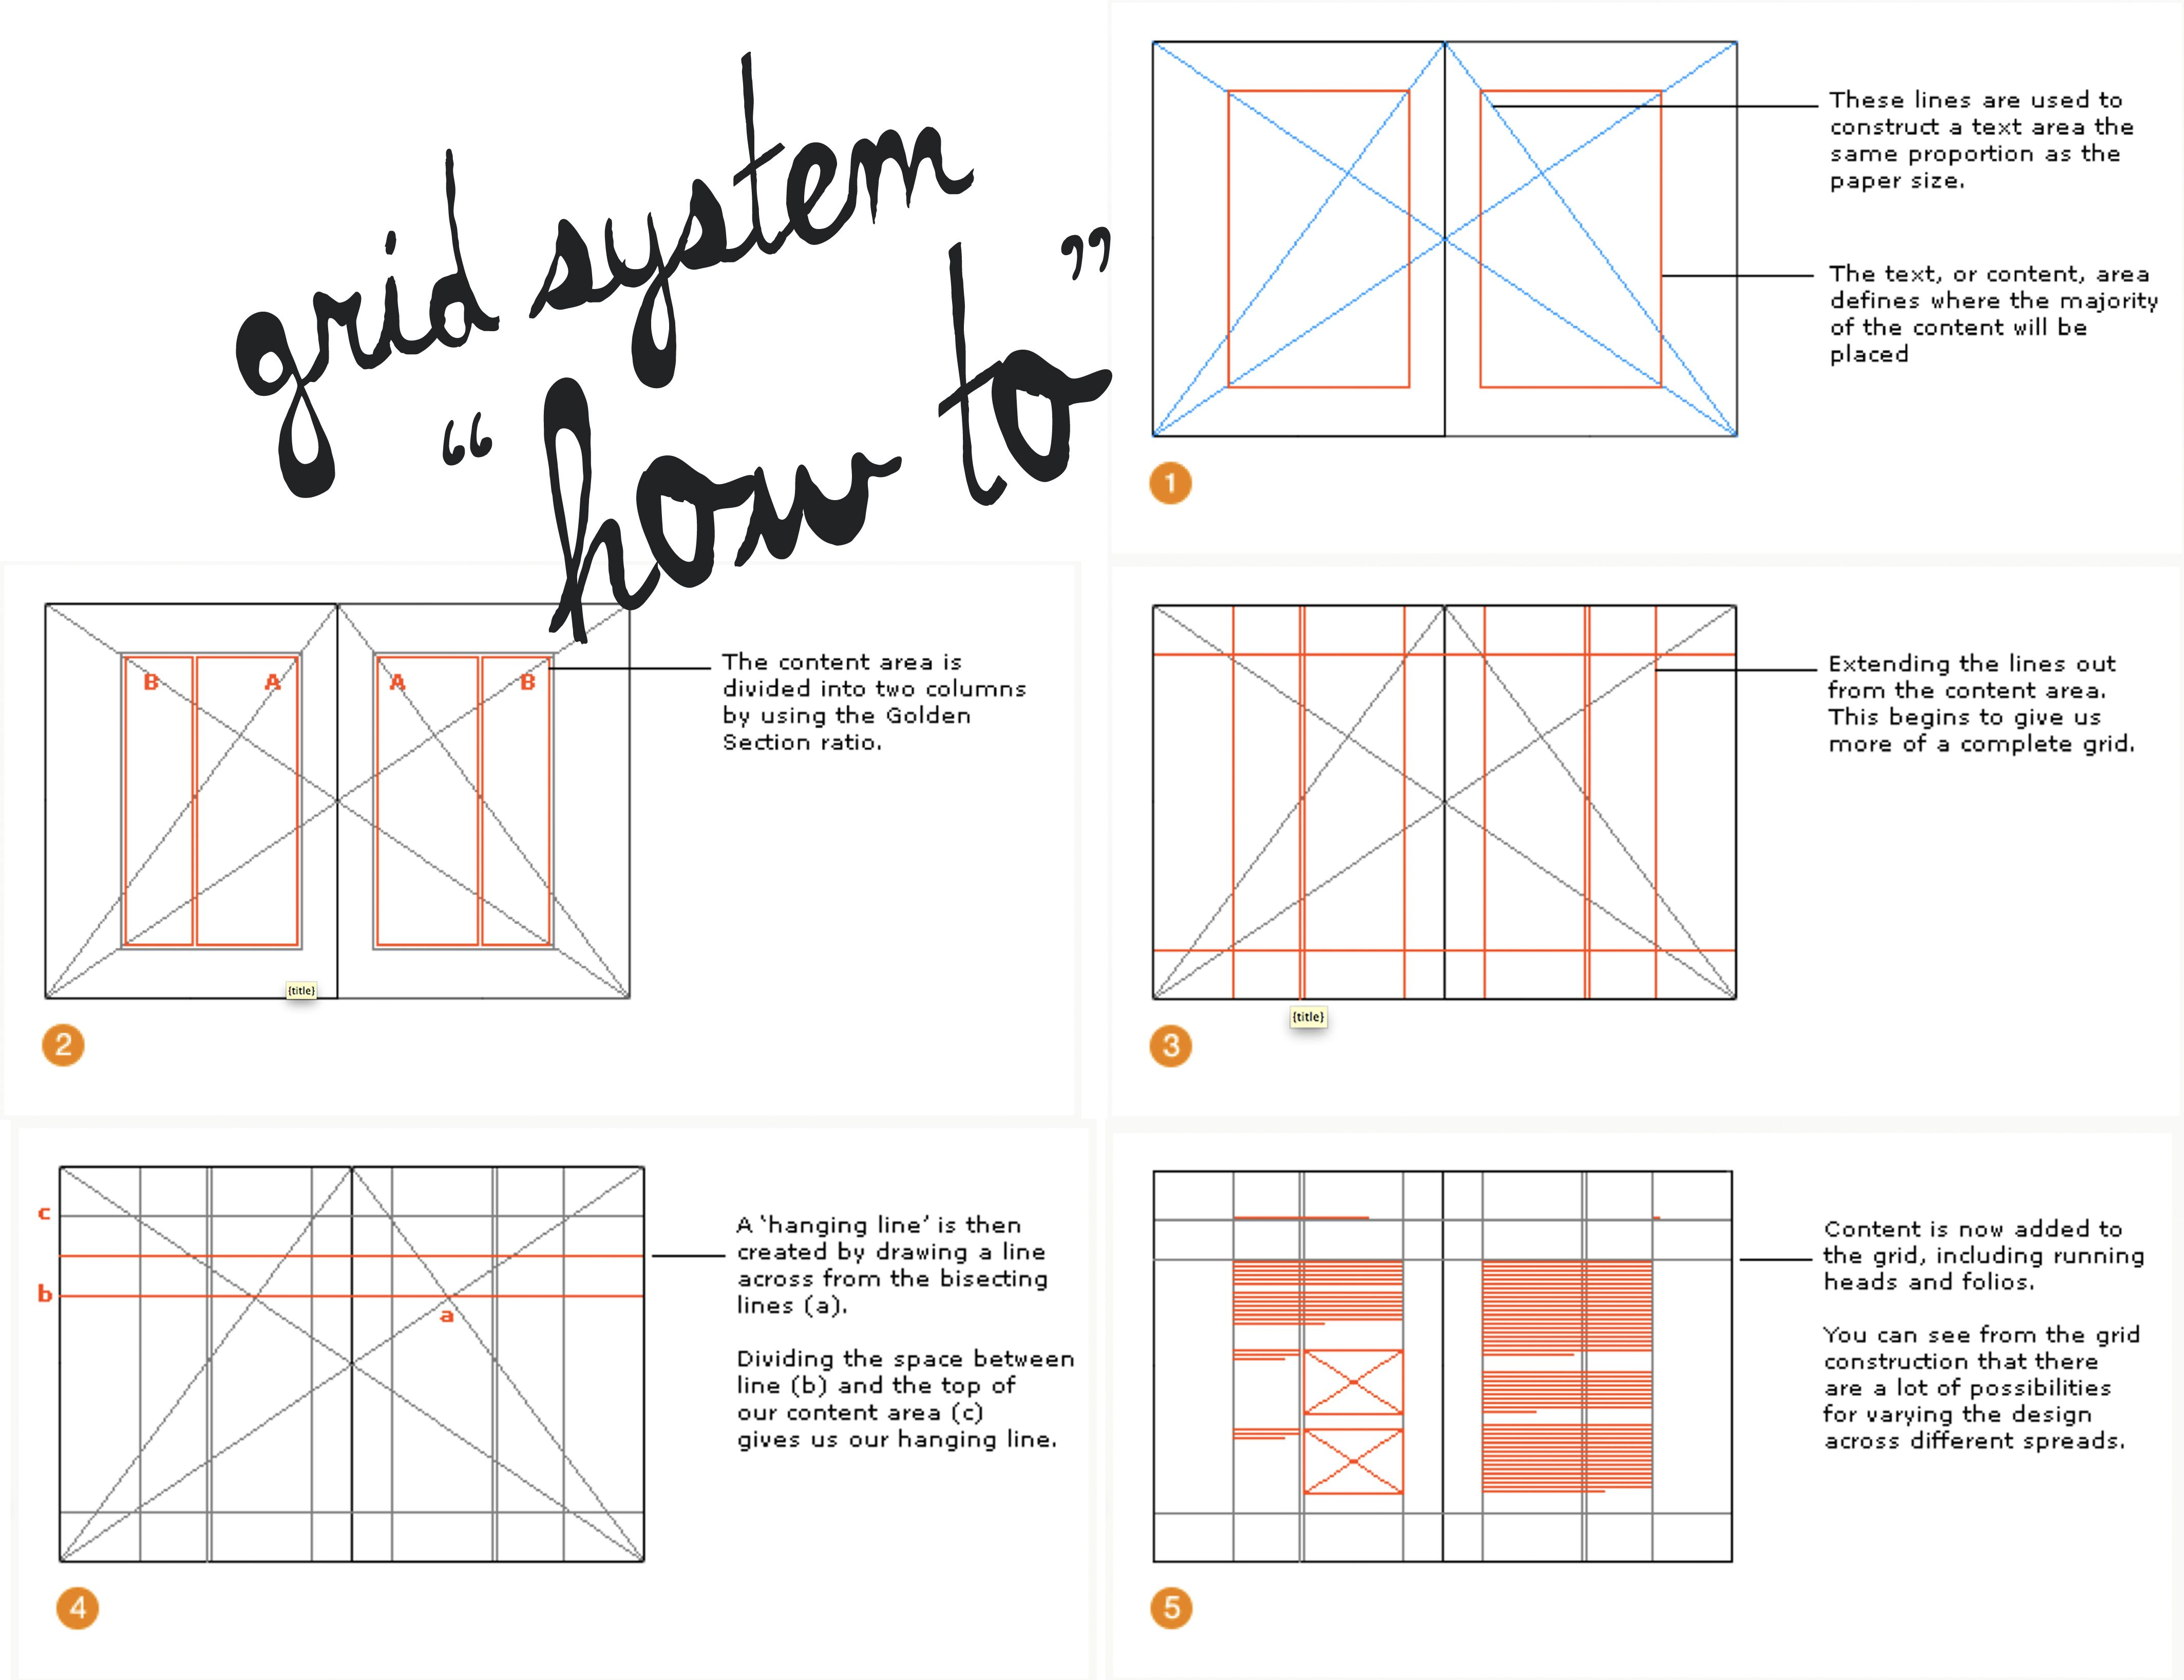 Book Cover Design Grid : Pin by leo tsoi on publication design pinterest